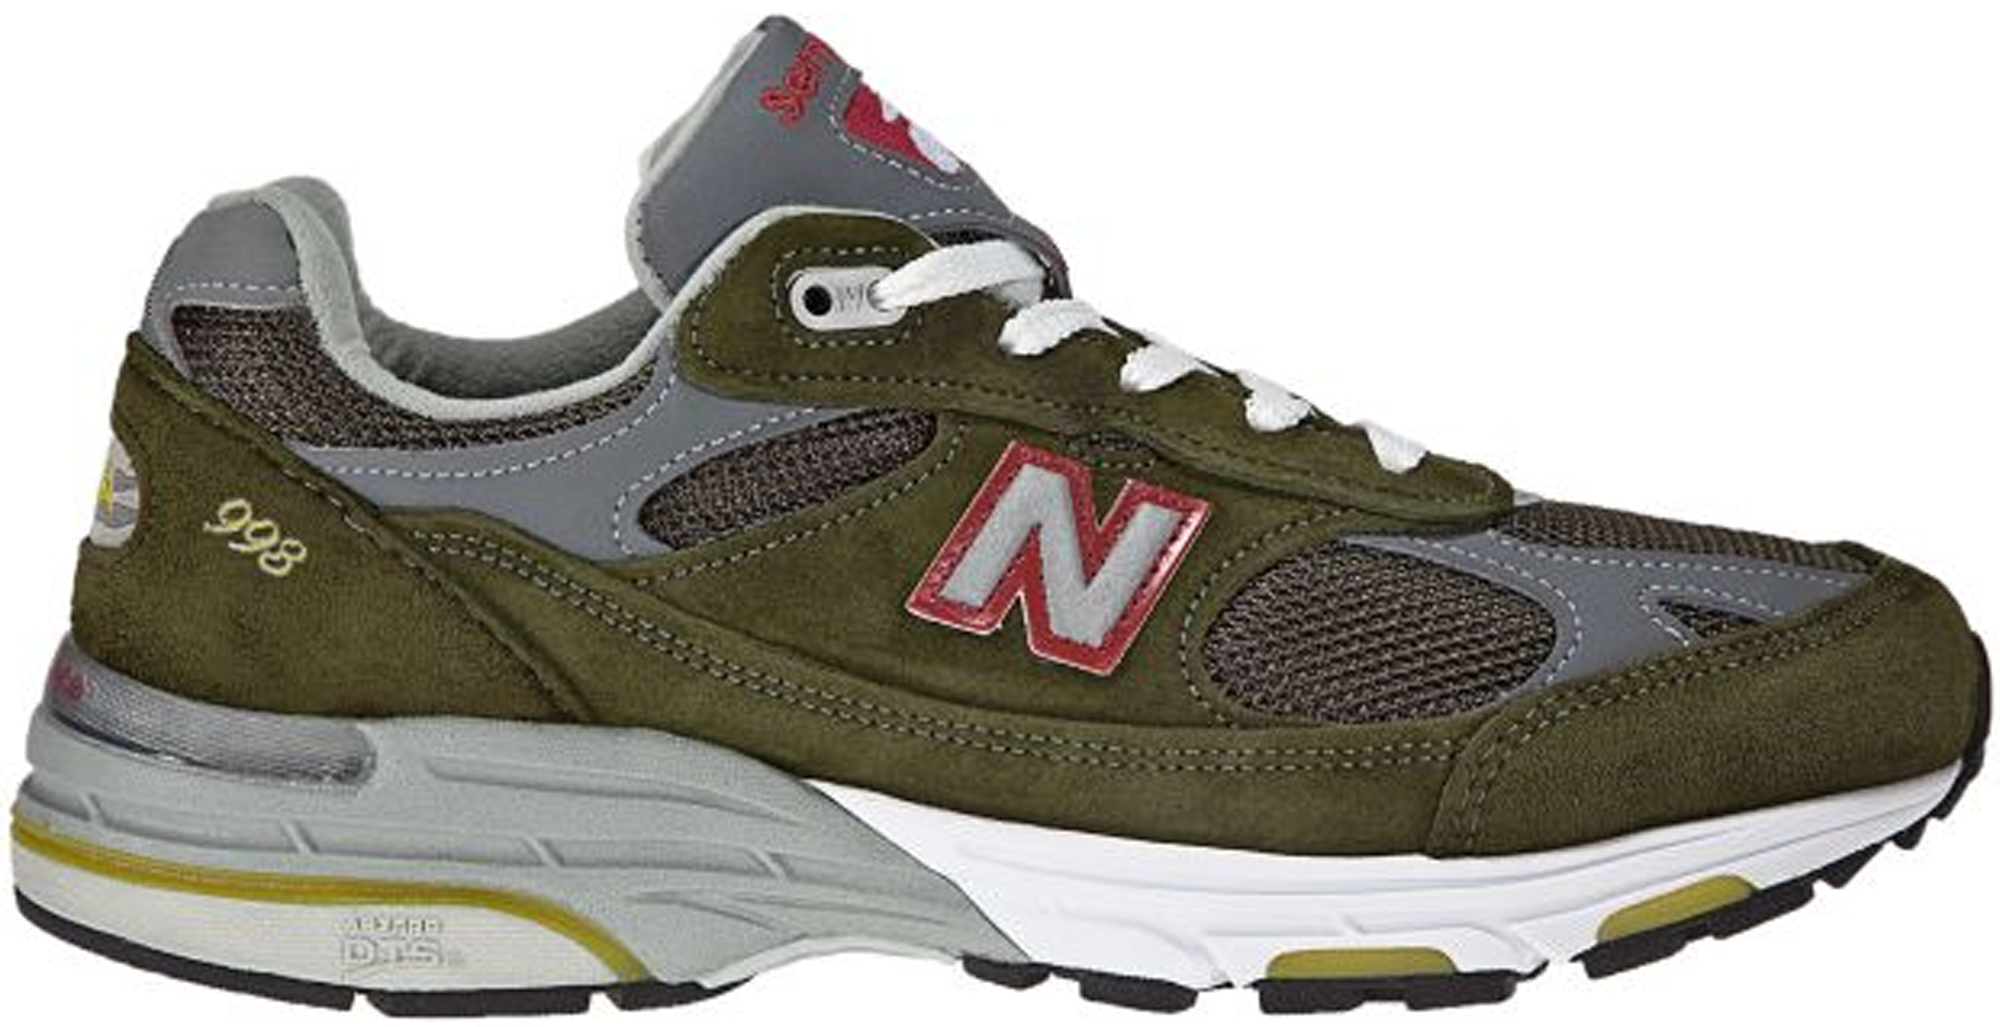 New Balance 993 Marines - Sneakers